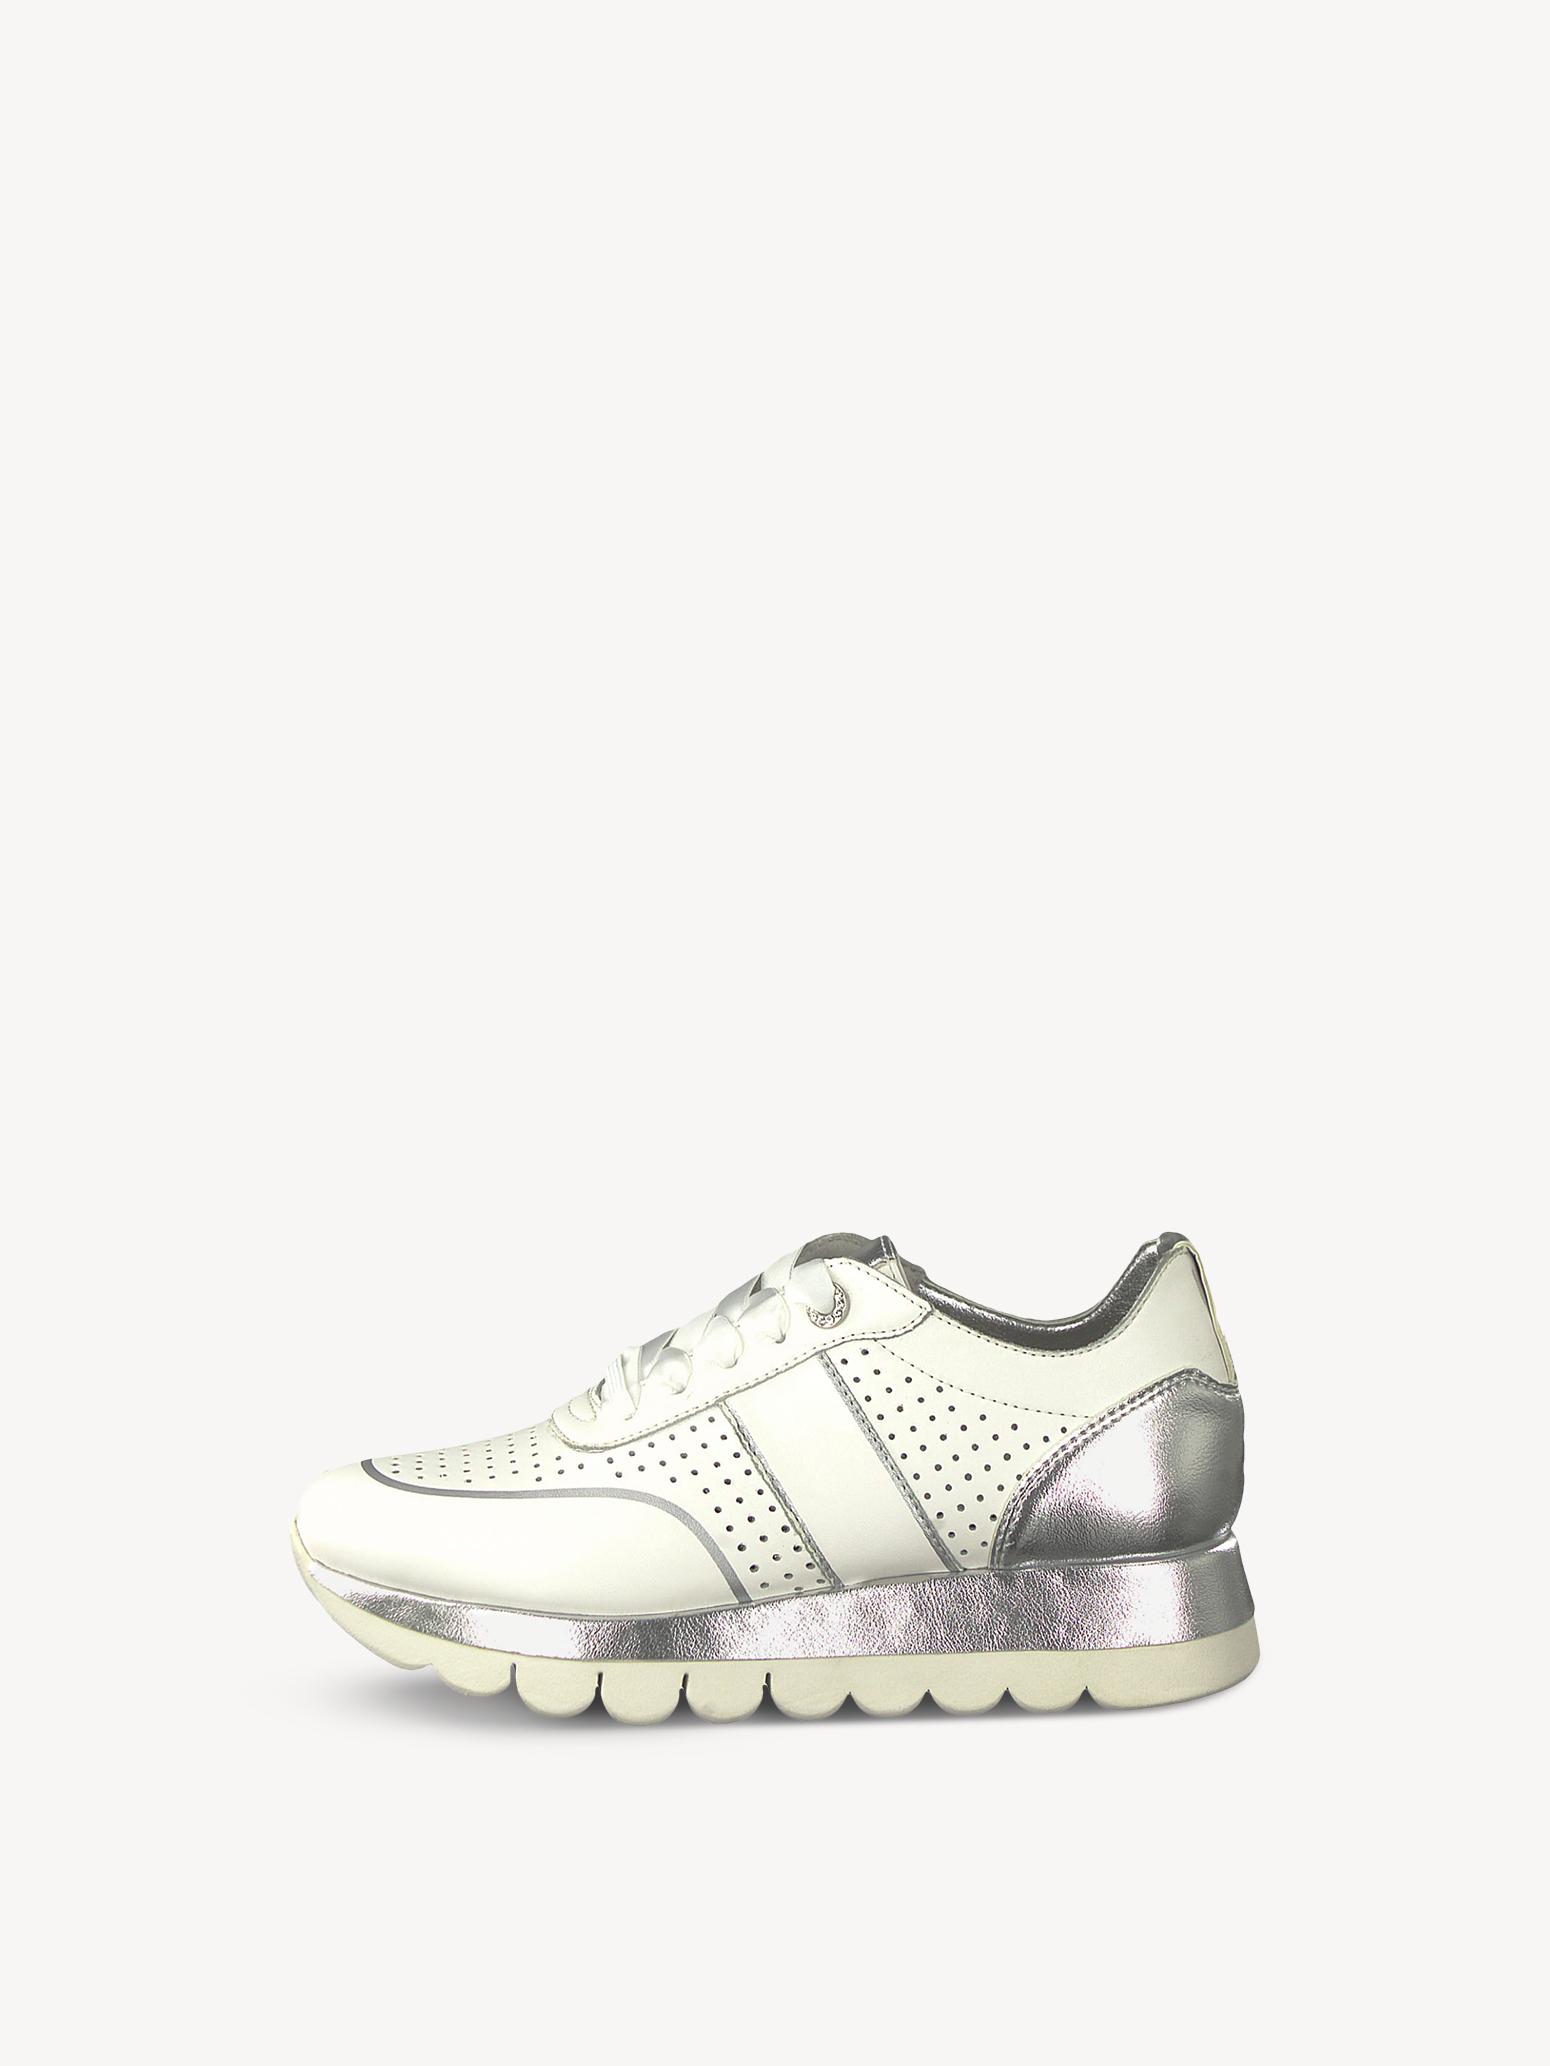 outlet größte Auswahl große Vielfalt Modelle Doro Sneaker